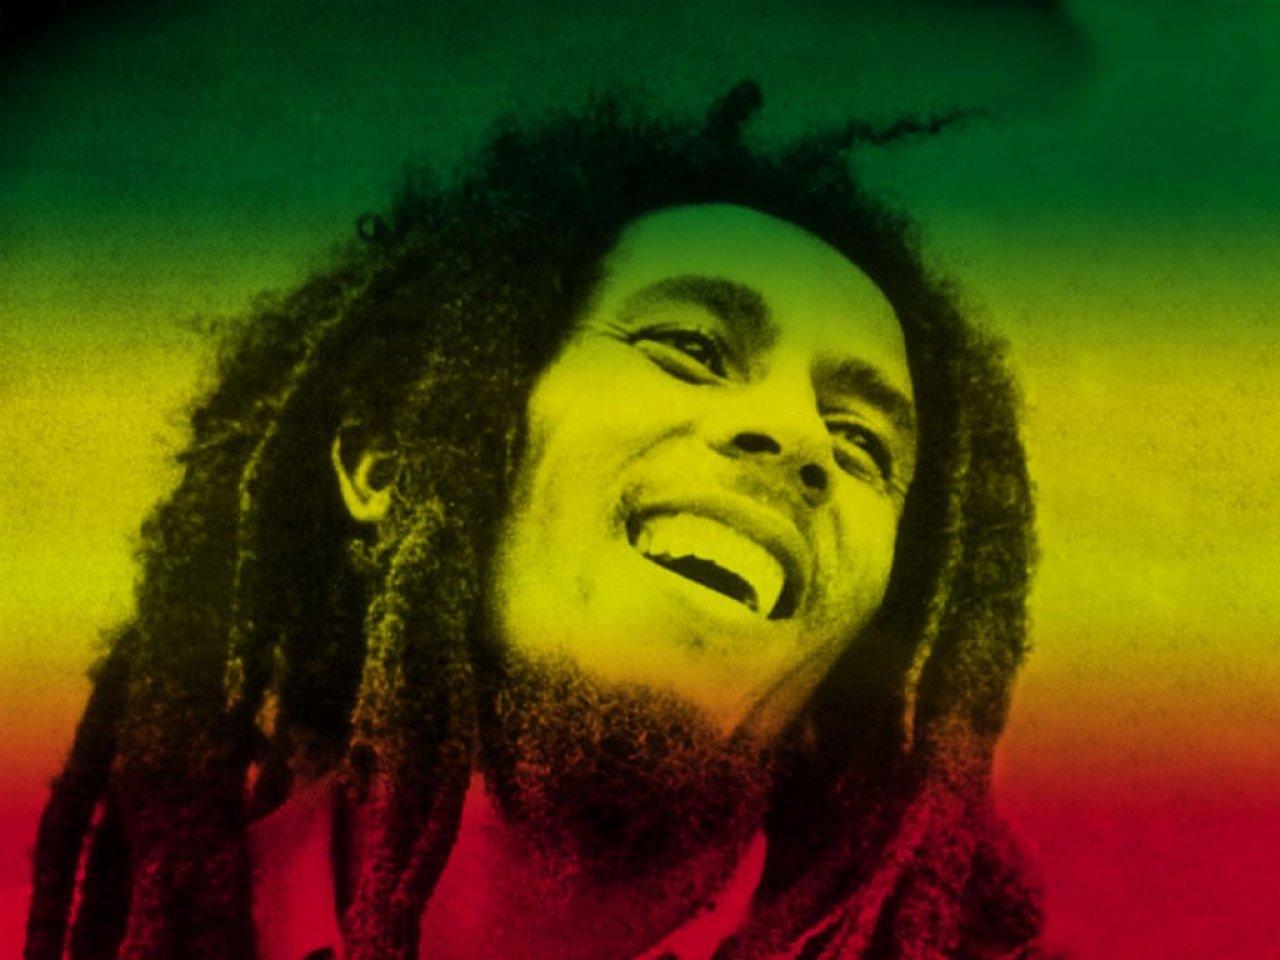 http://1.bp.blogspot.com/_fEUF5oa53EM/TM4jWoCbpeI/AAAAAAAAApY/ESgD_5RtHwc/s1600/Bob_Marley_wallpaper_picture_image_free_music_Reggae_desktop_wallpaper_1280.jpg